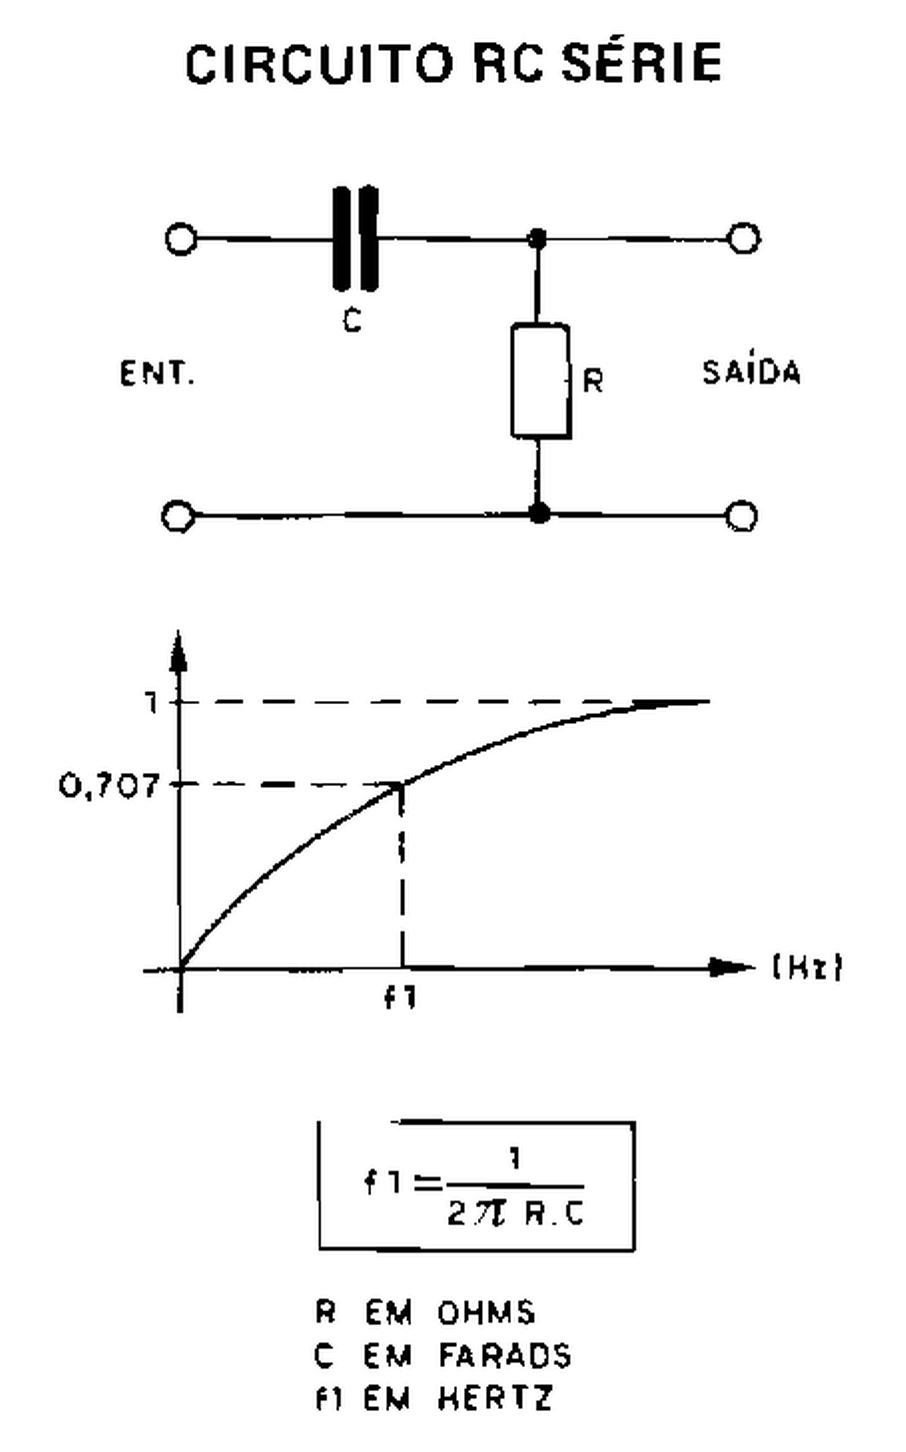 Circuito Rc : EletrÔnica geral circuito rc série